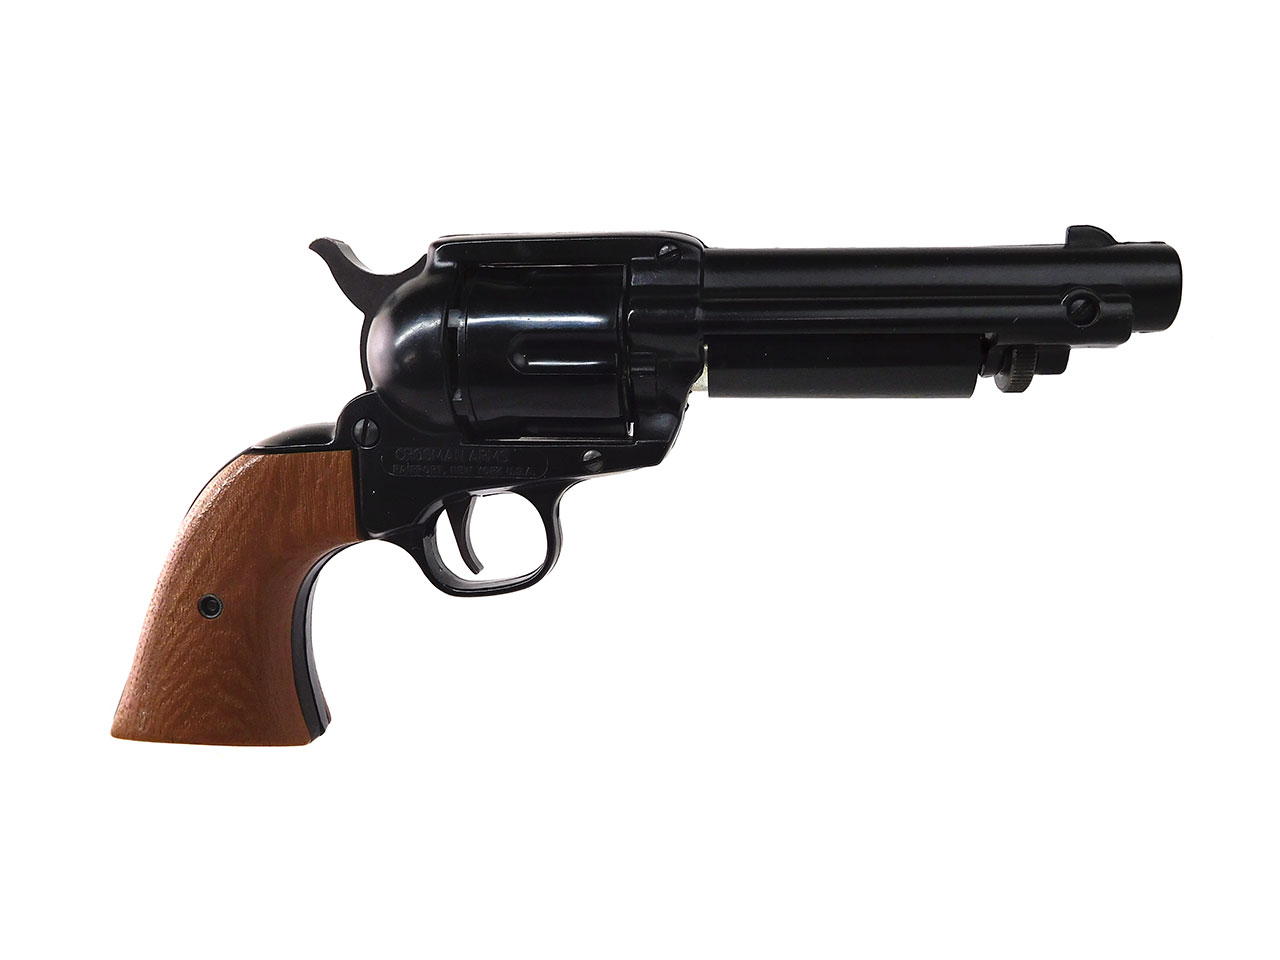 crosman peacemaker model 44 manual